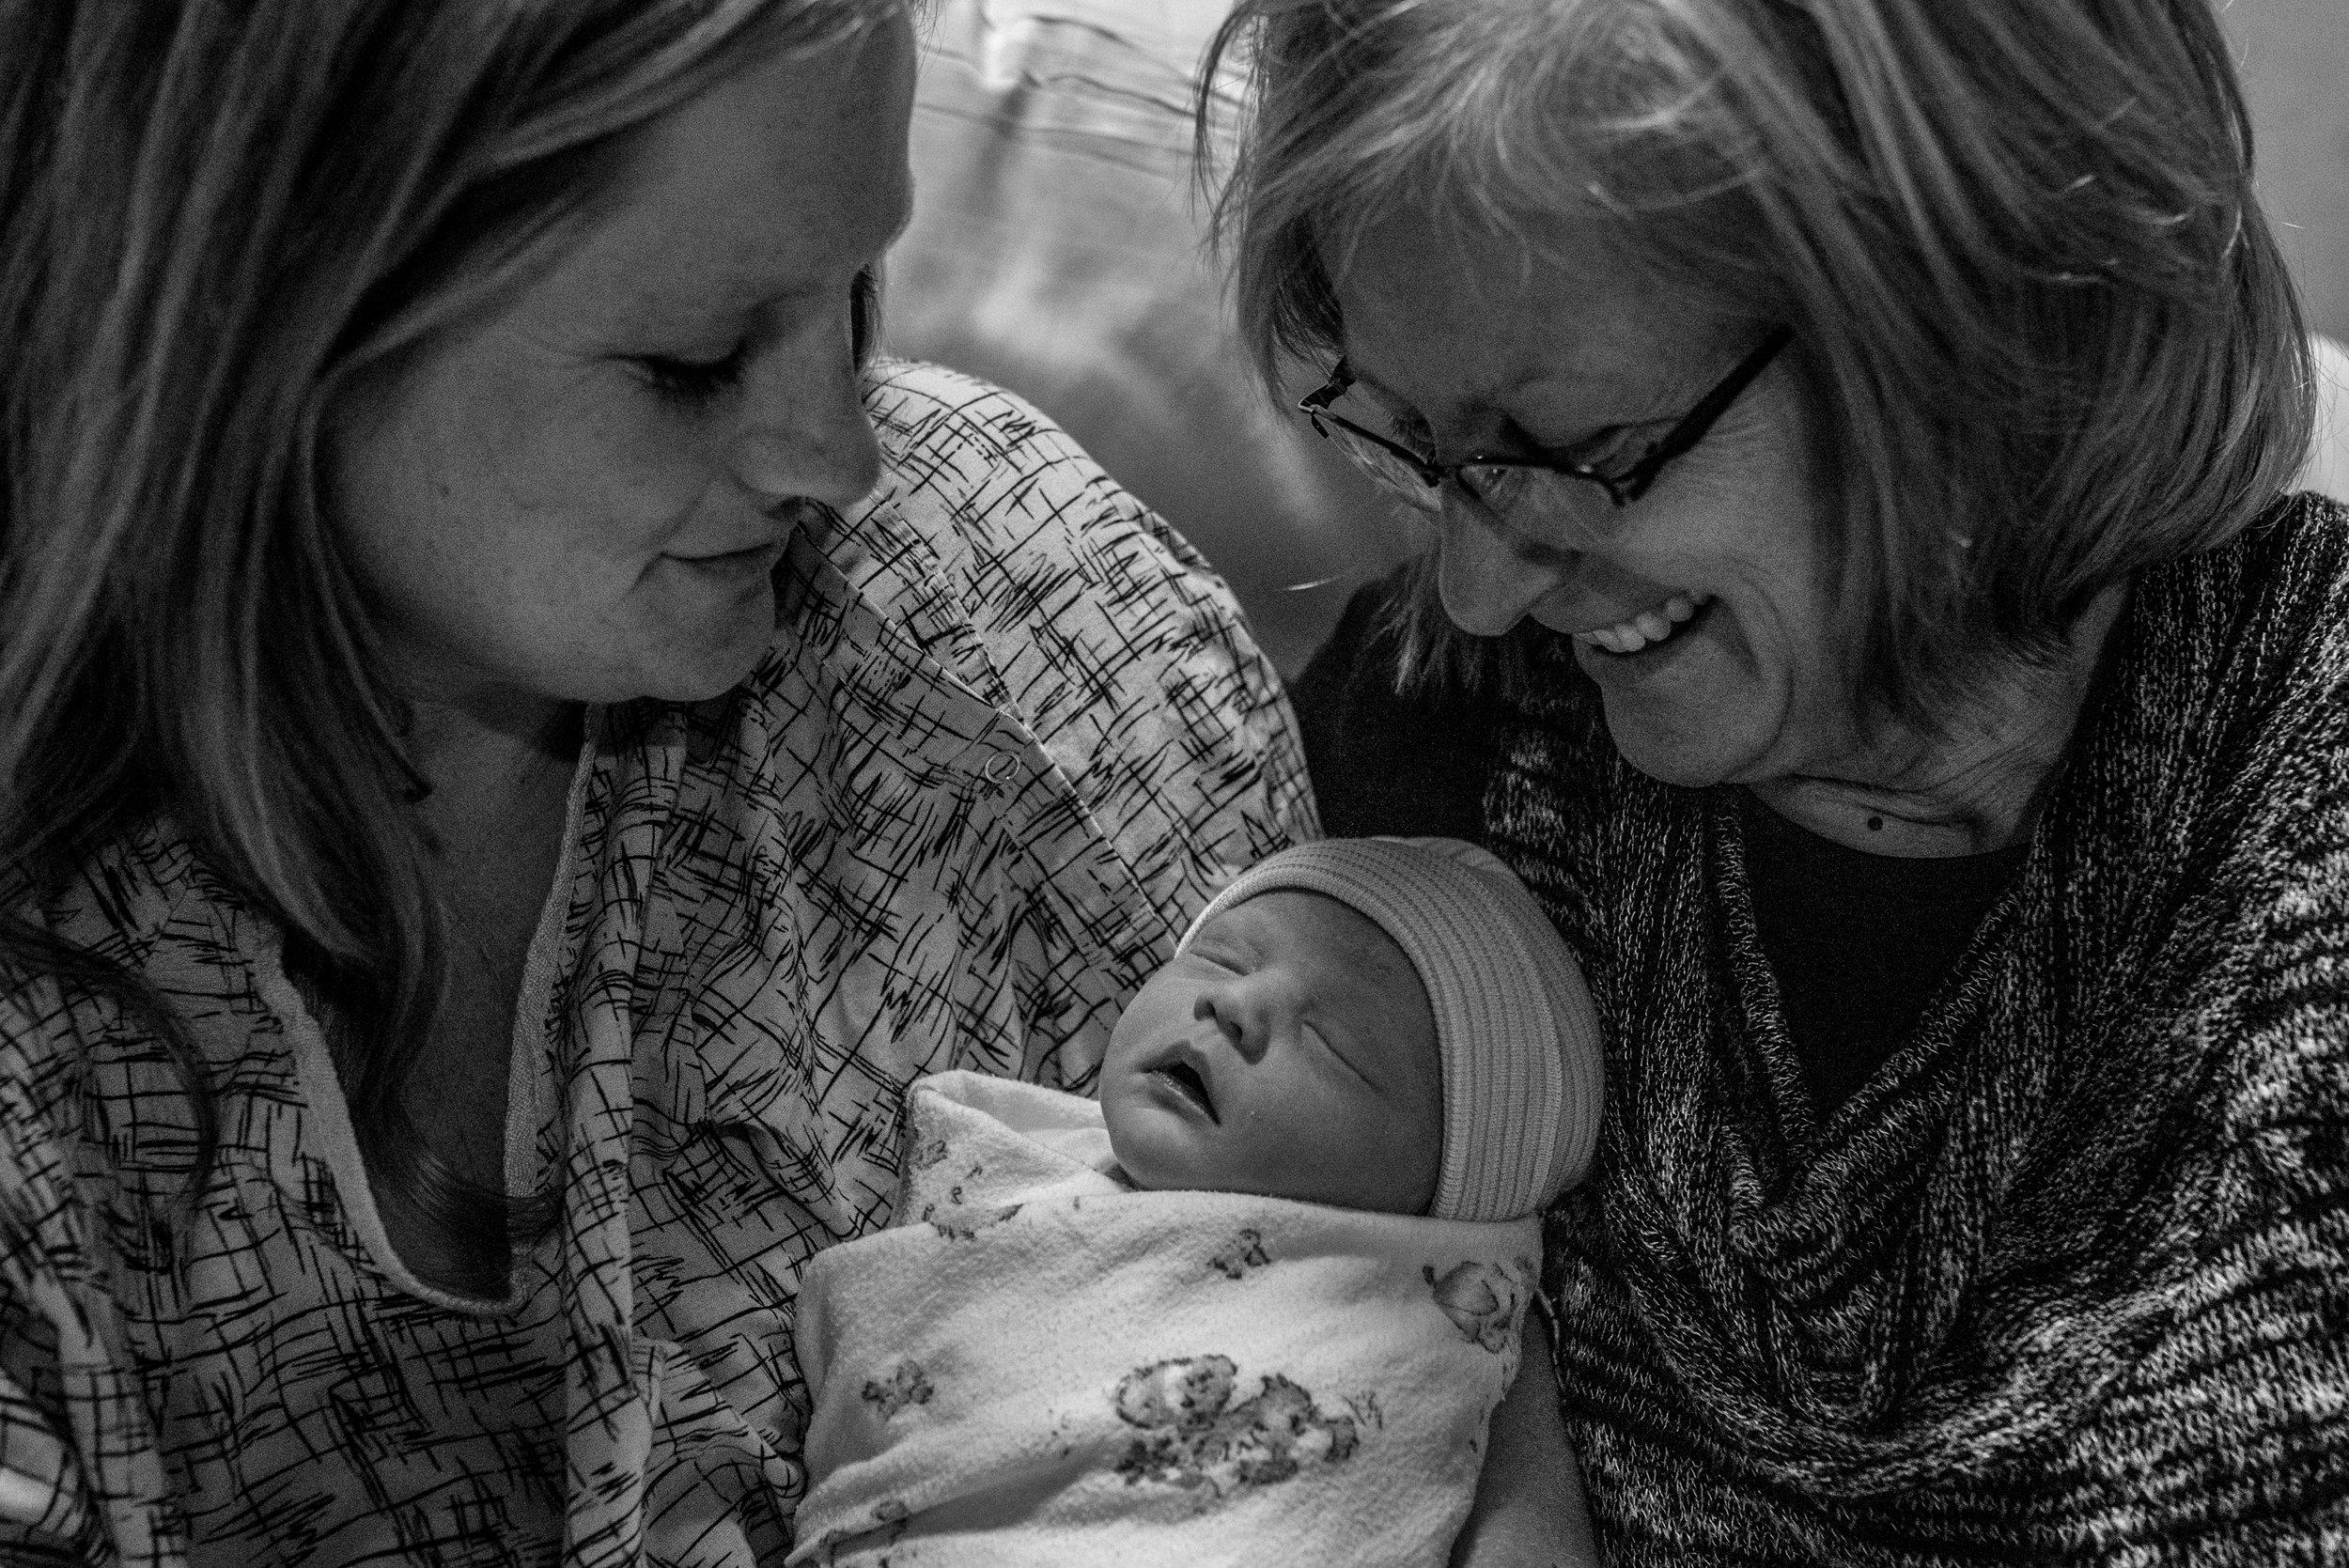 Mom and grandma looking at newborn baby